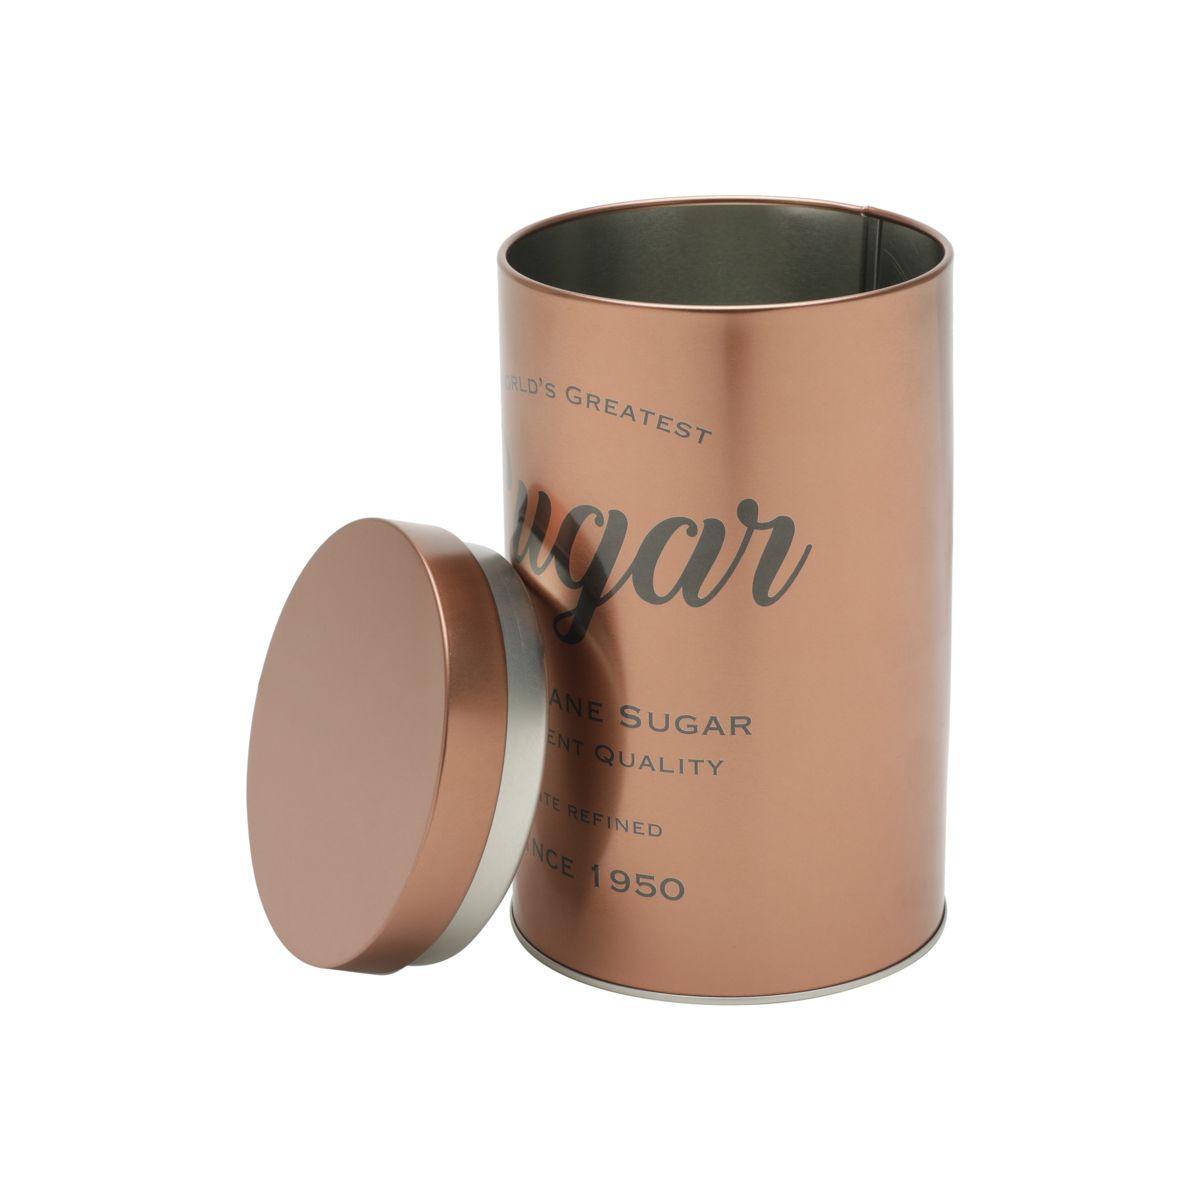 Lata Metal Retrô Expresso Round Pure Sugar cor/Cobre